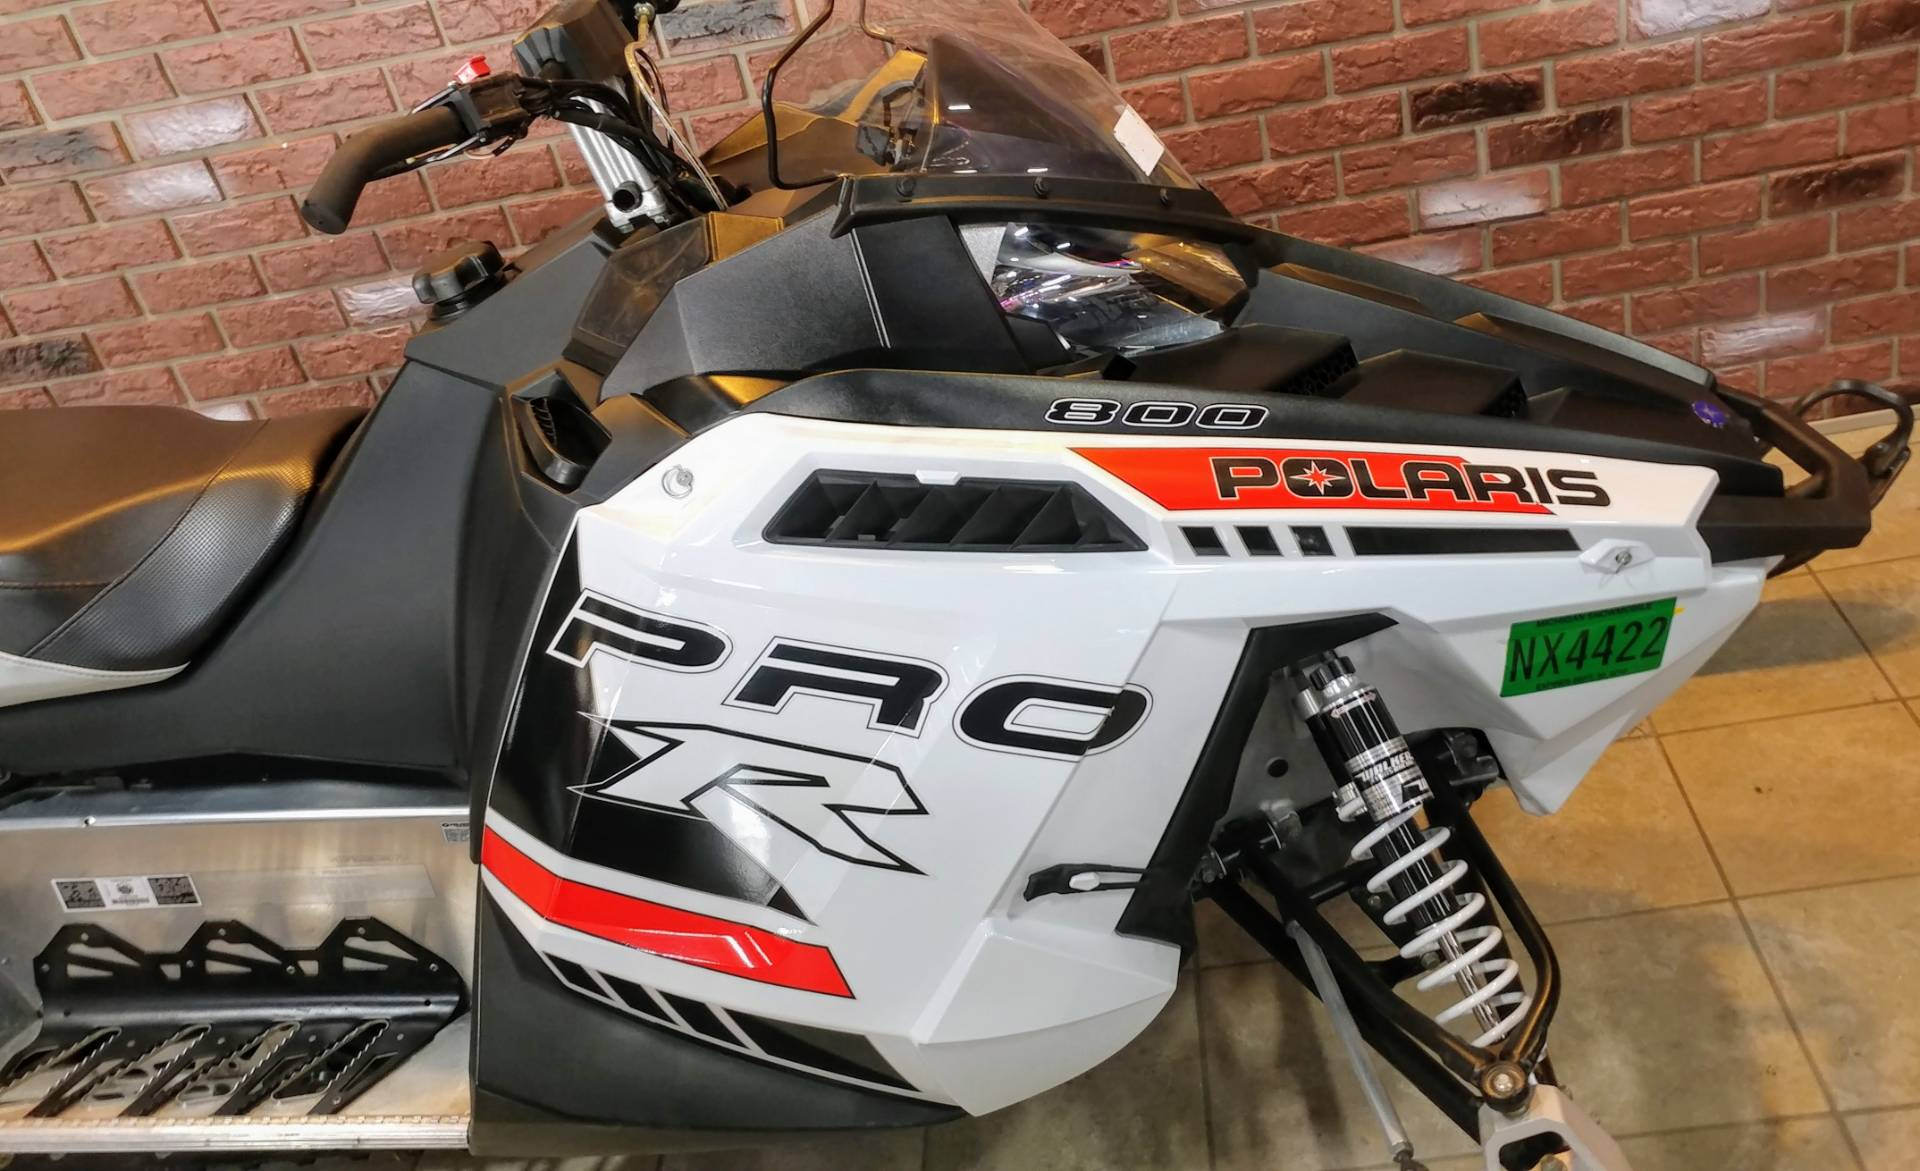 2014 Polaris 800 Rush® PRO-R Snowmobiles for Sale in Lansing, MI ...